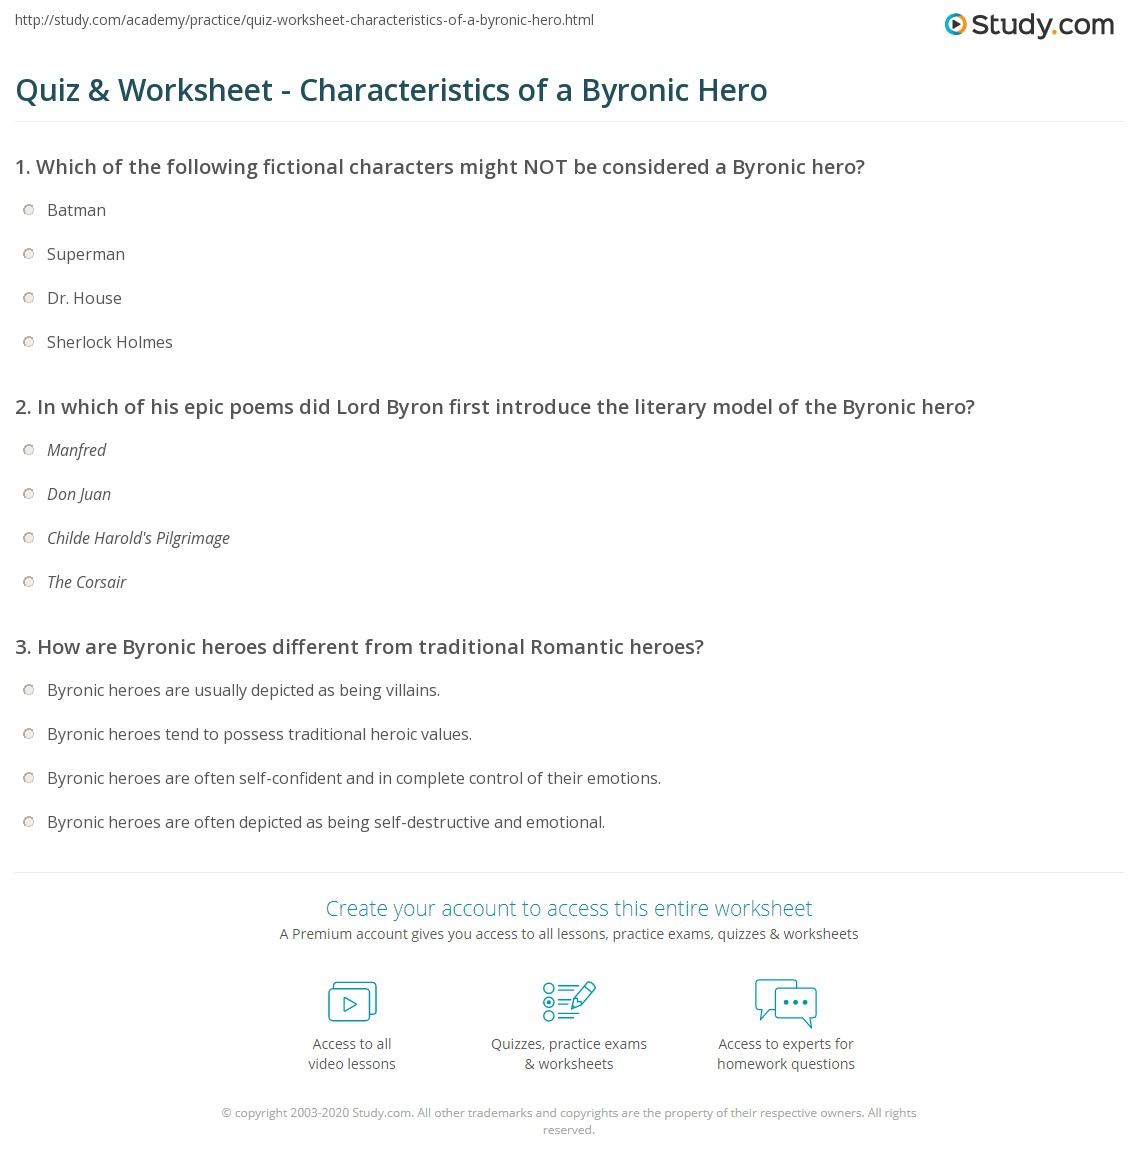 Byronic Hero Traits Quiz Worksheet Characteristics Of A Byronic Hero